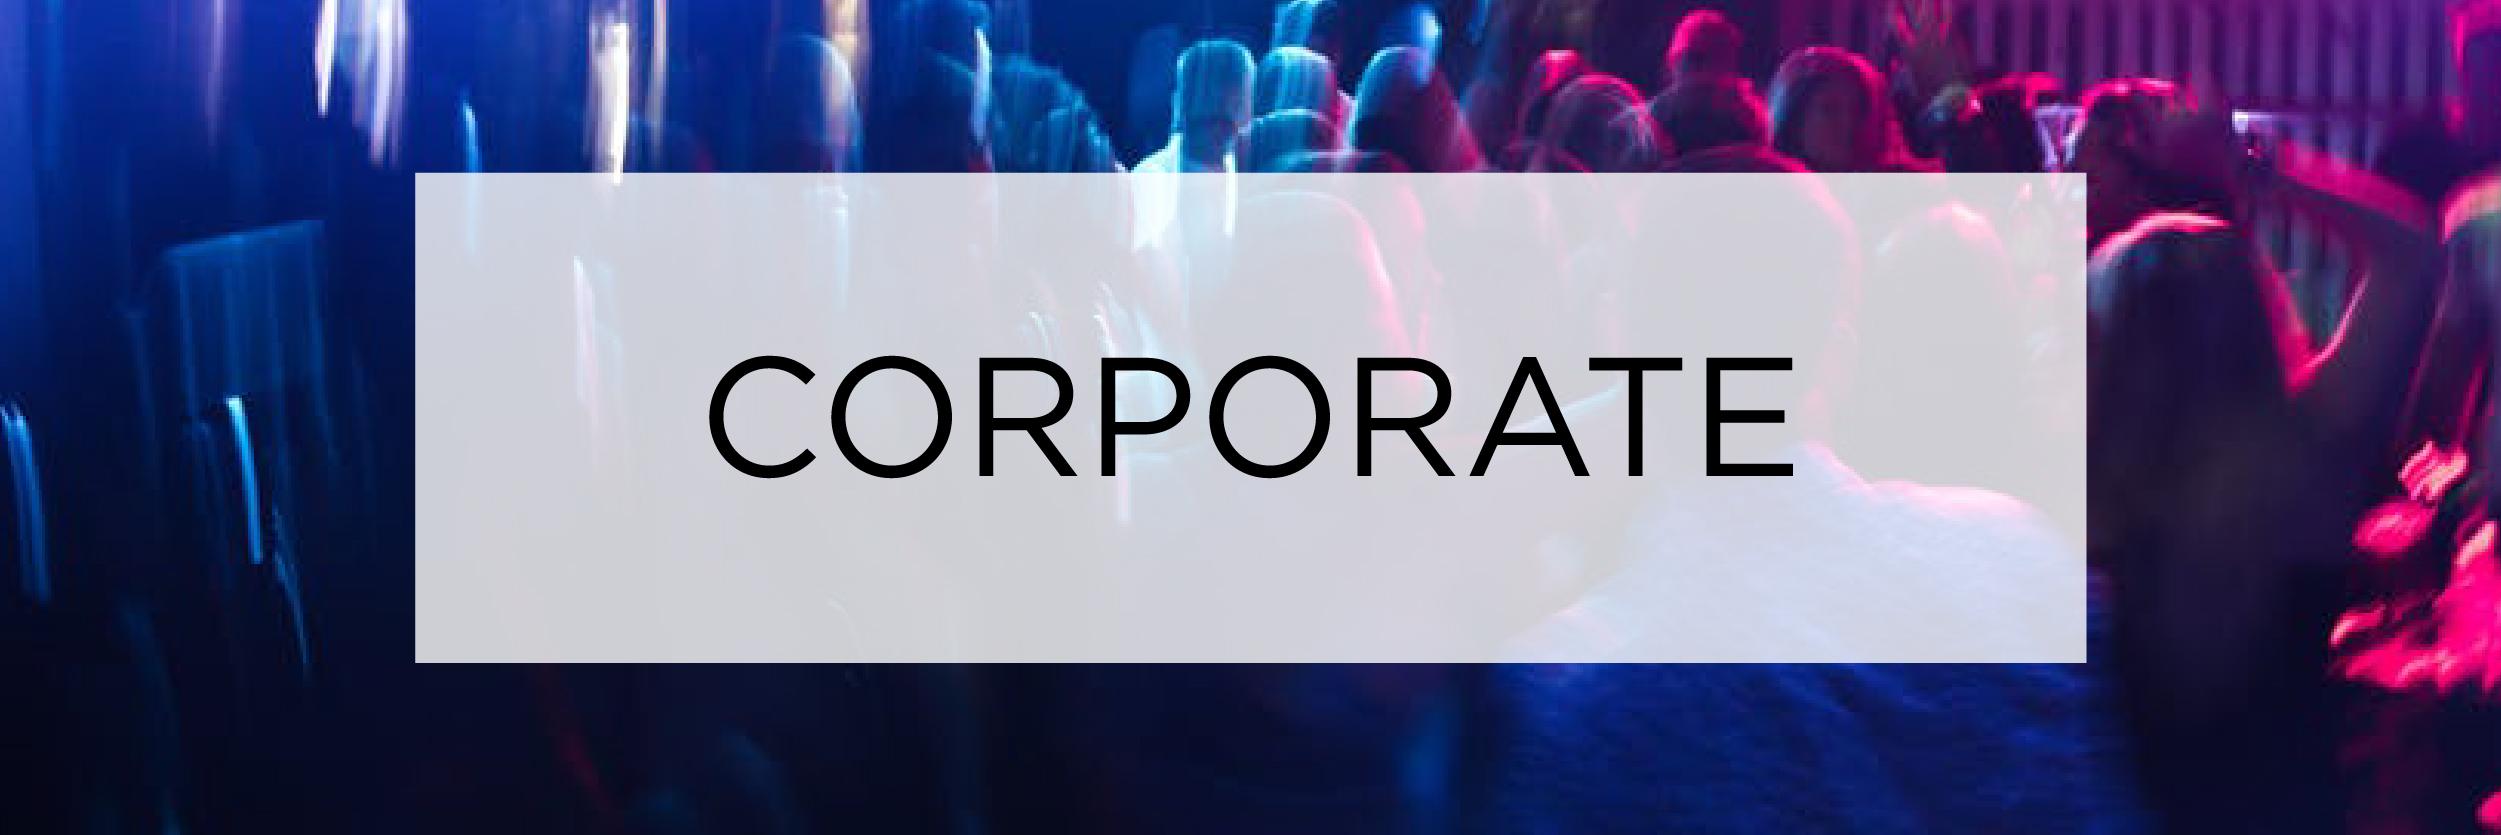 Corporate events entertainment